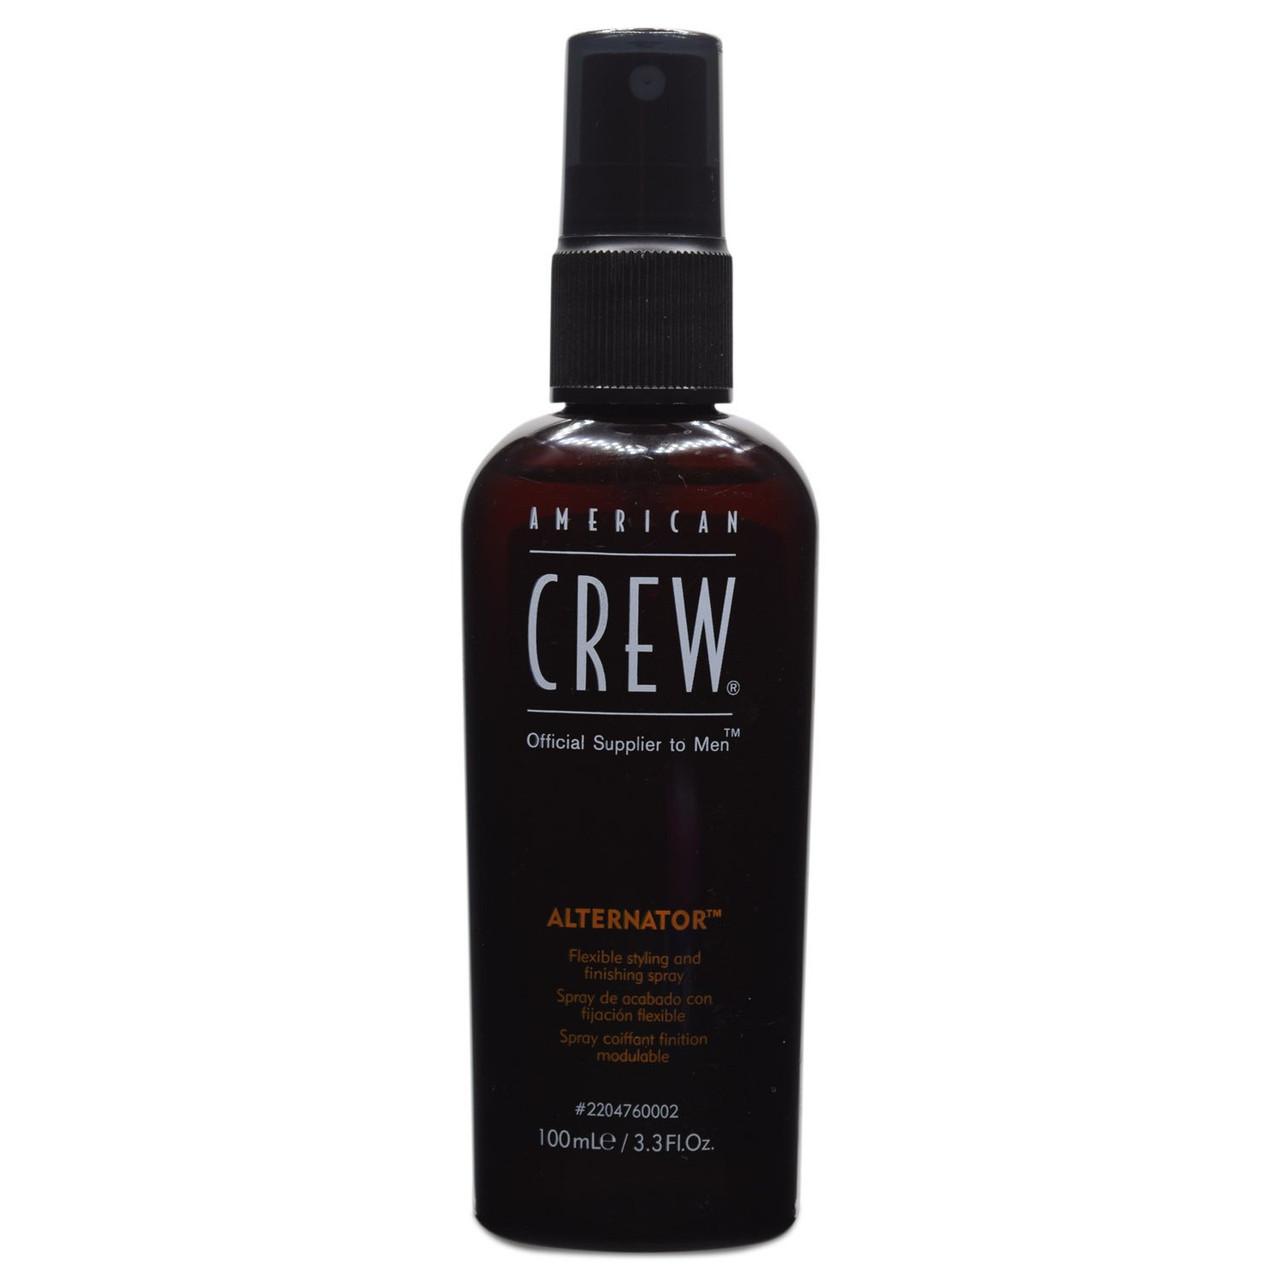 American Crew Alternator 3.3 oz